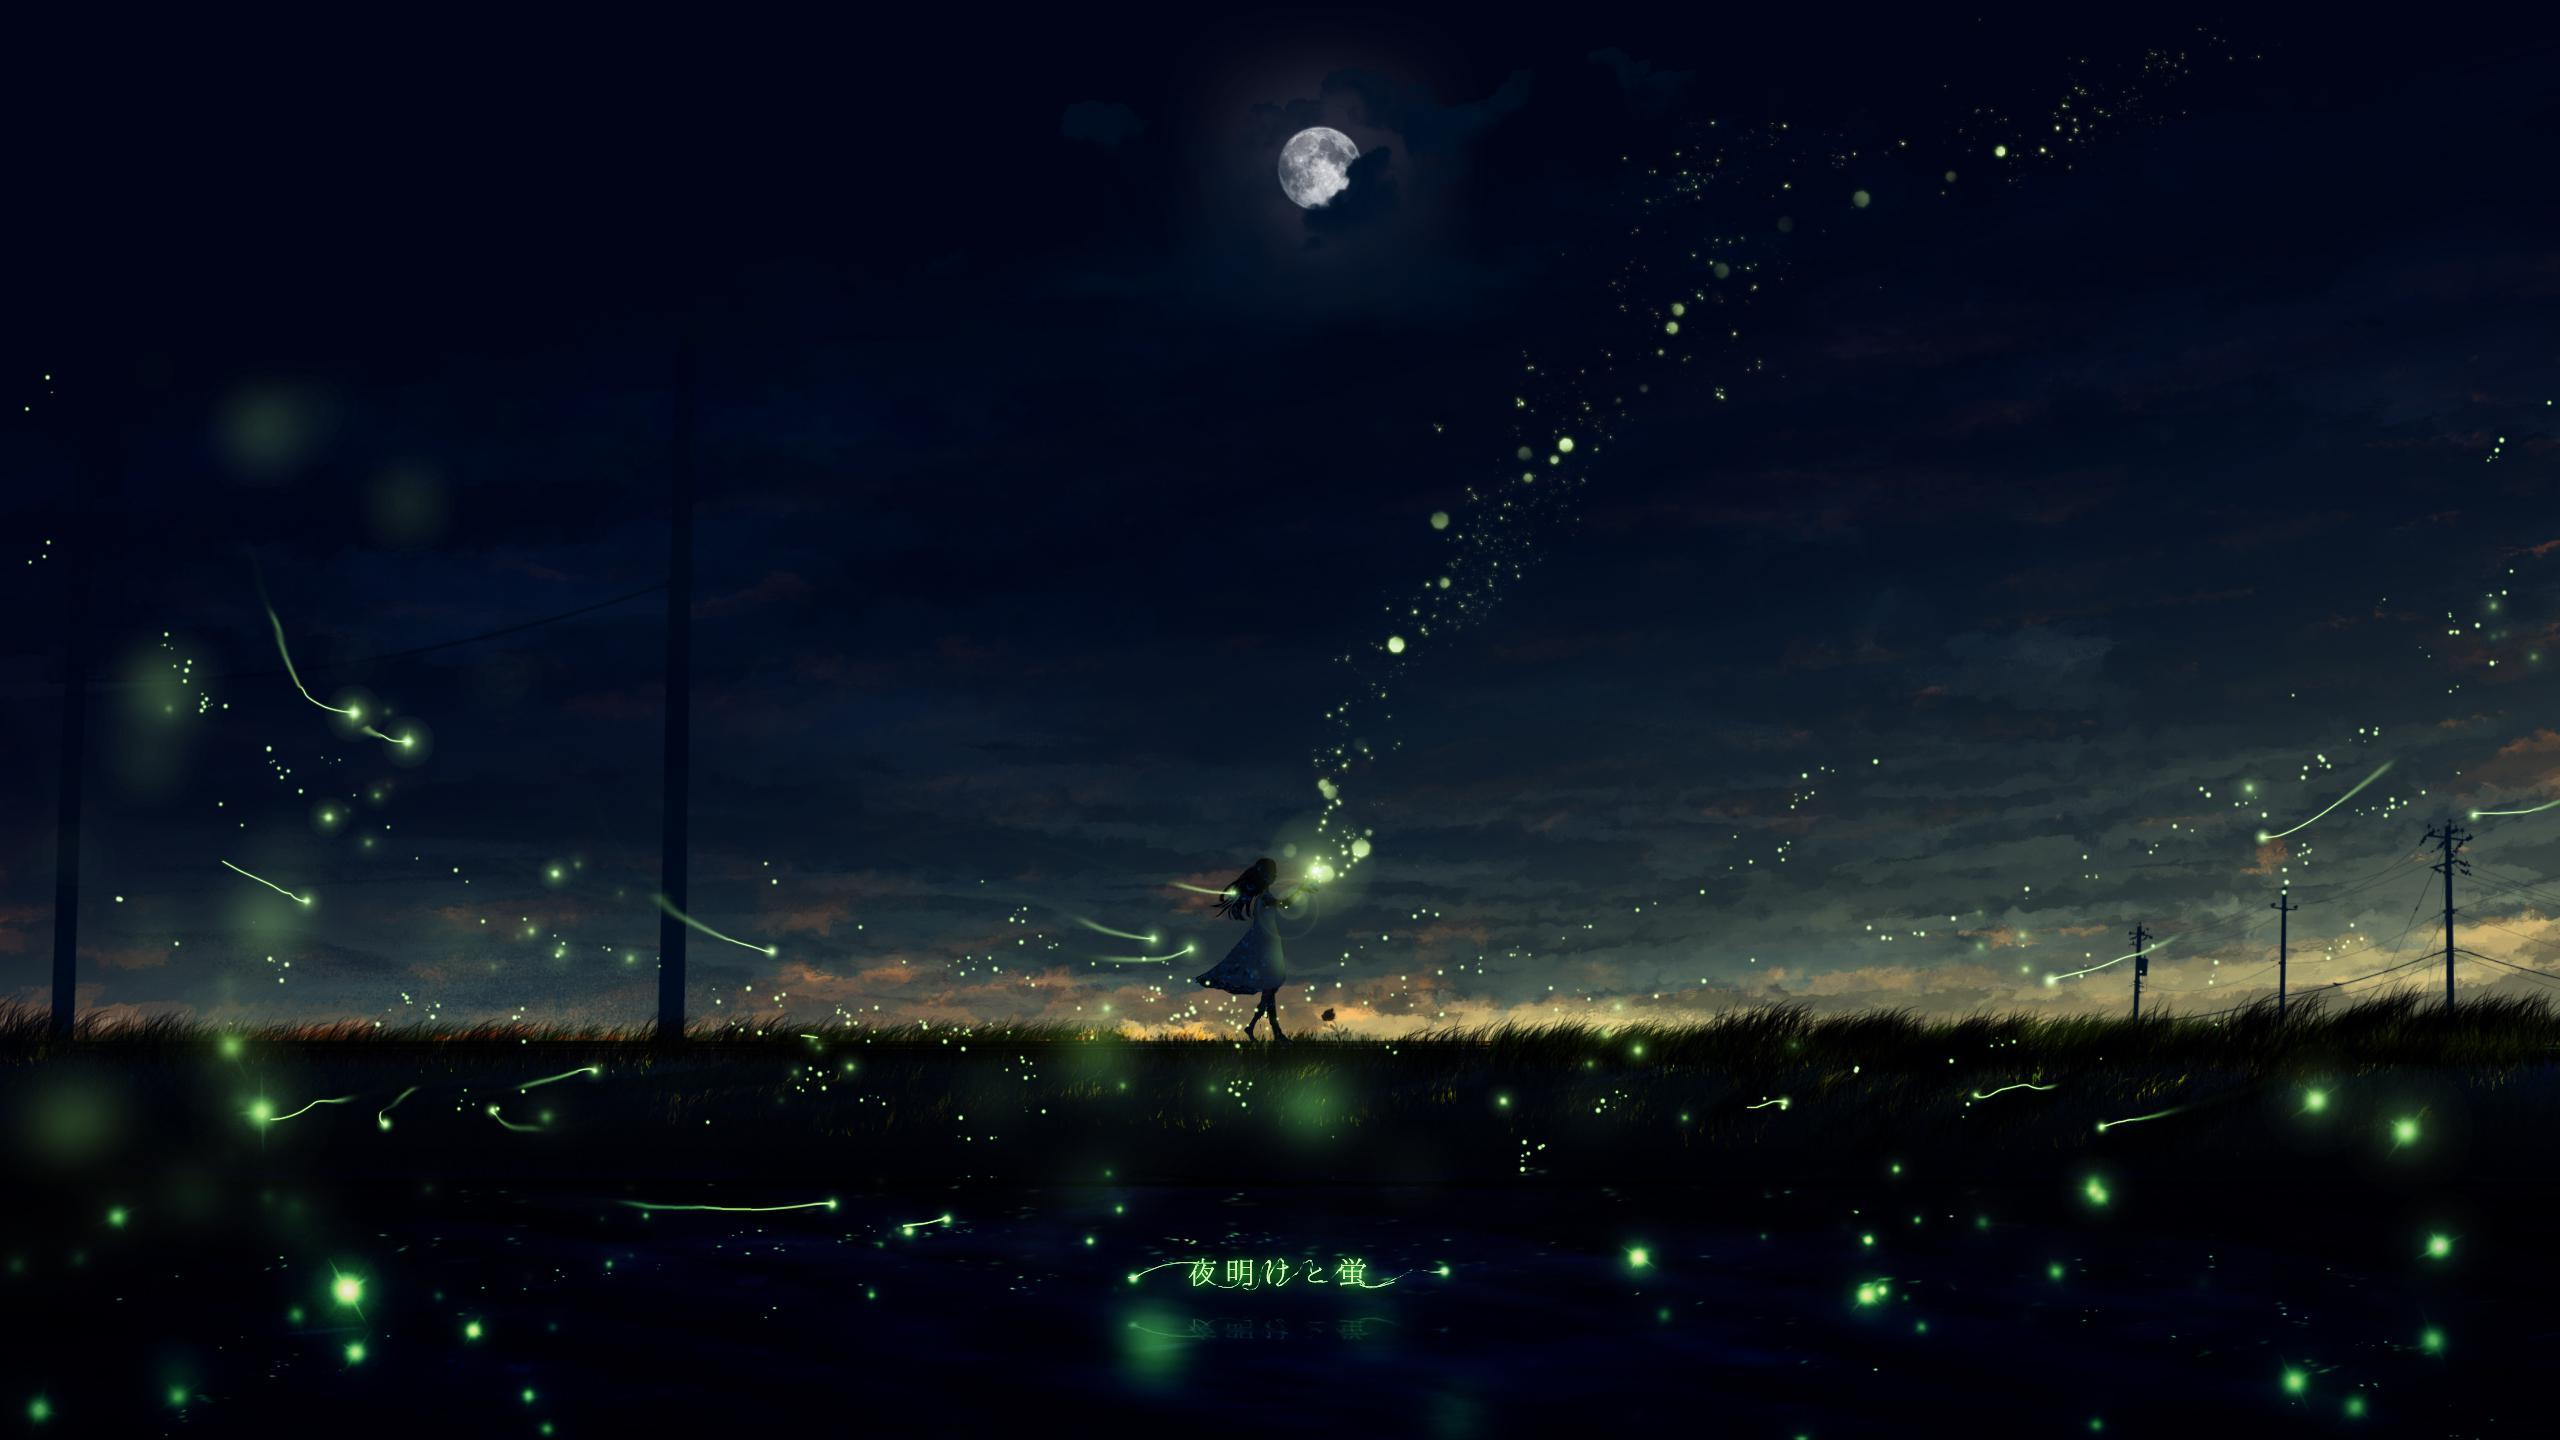 P站画师作品黎明与萤火虫